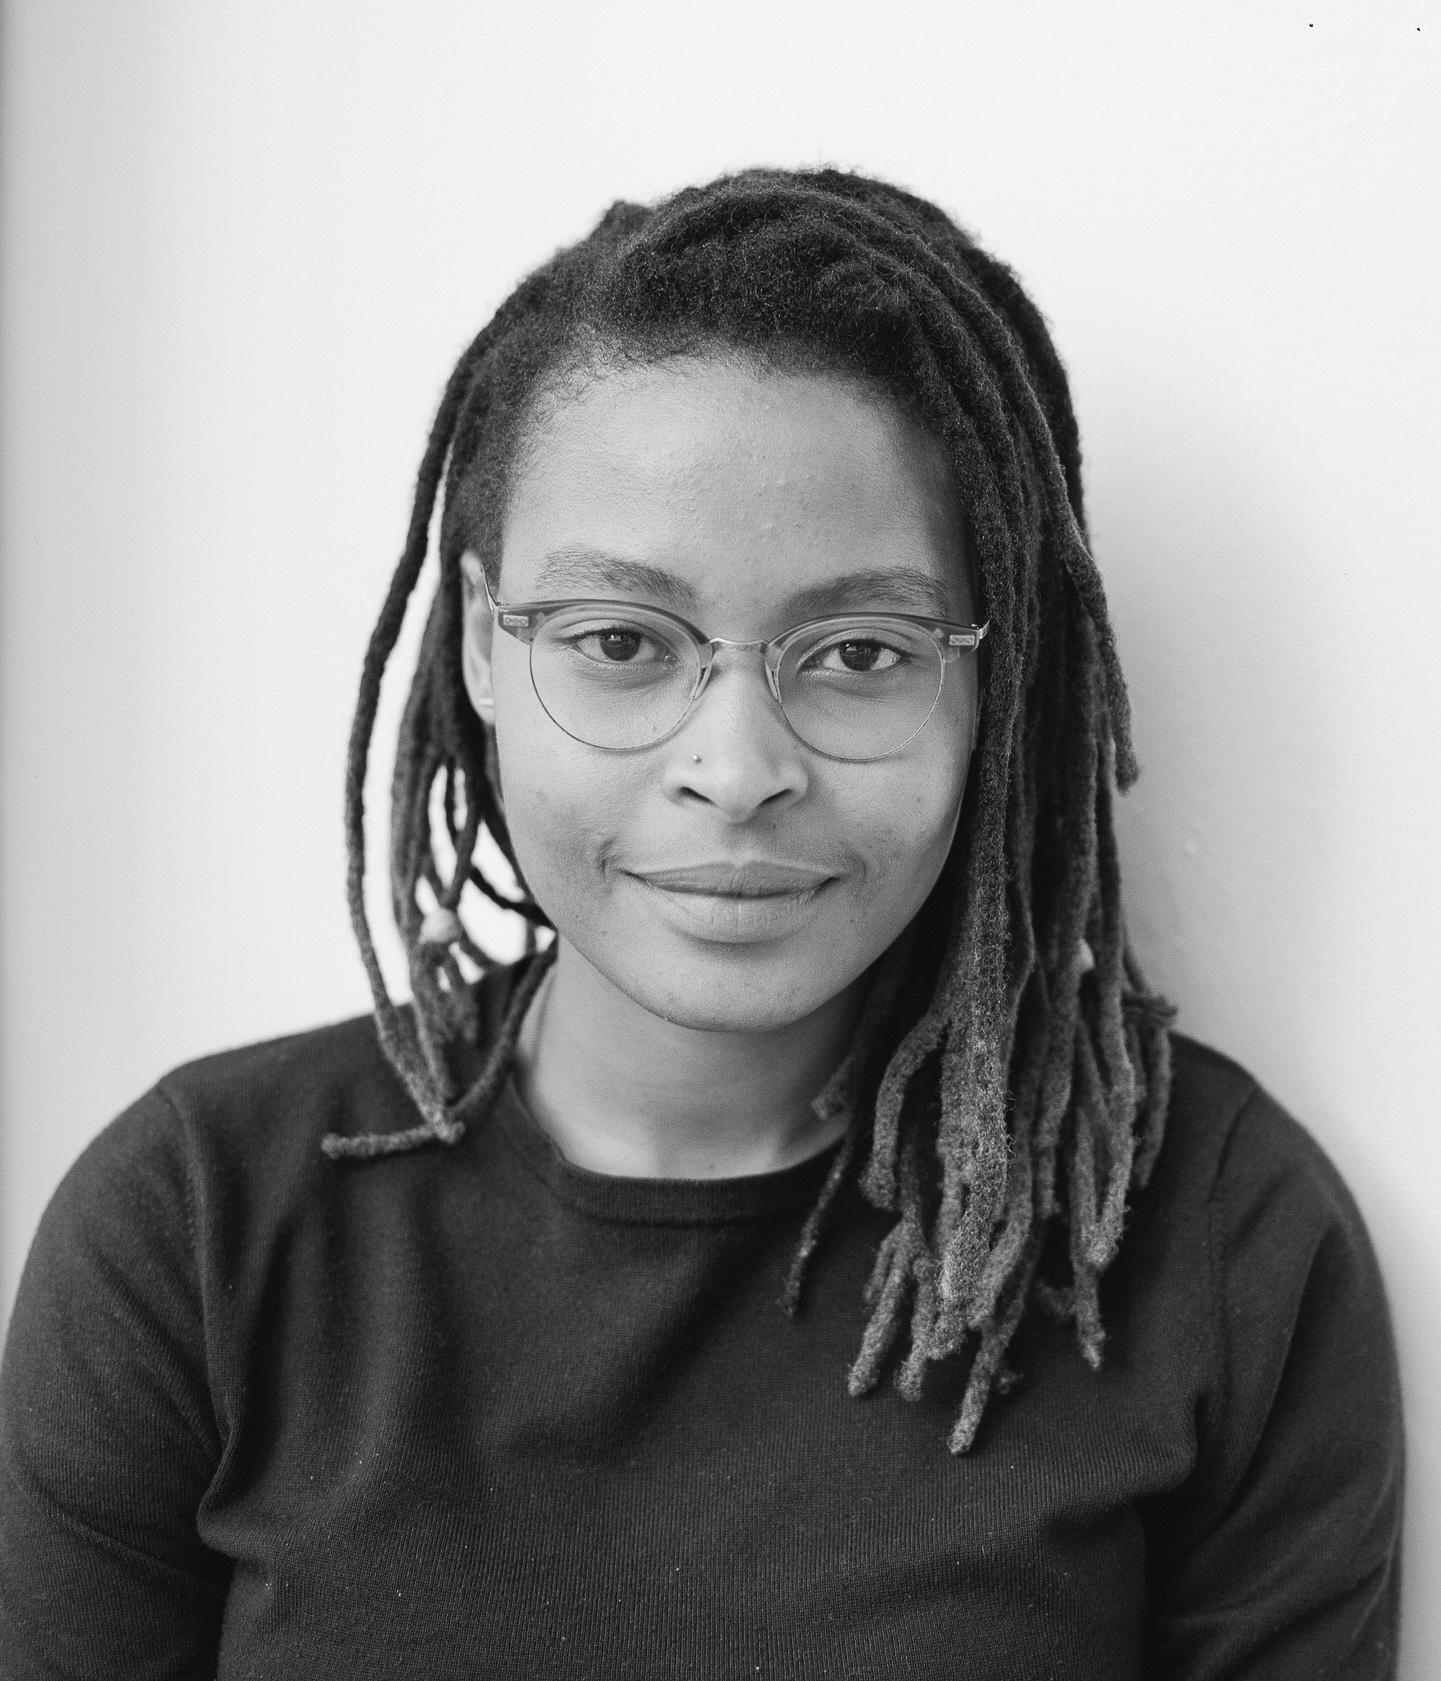 Valerie Lehabe